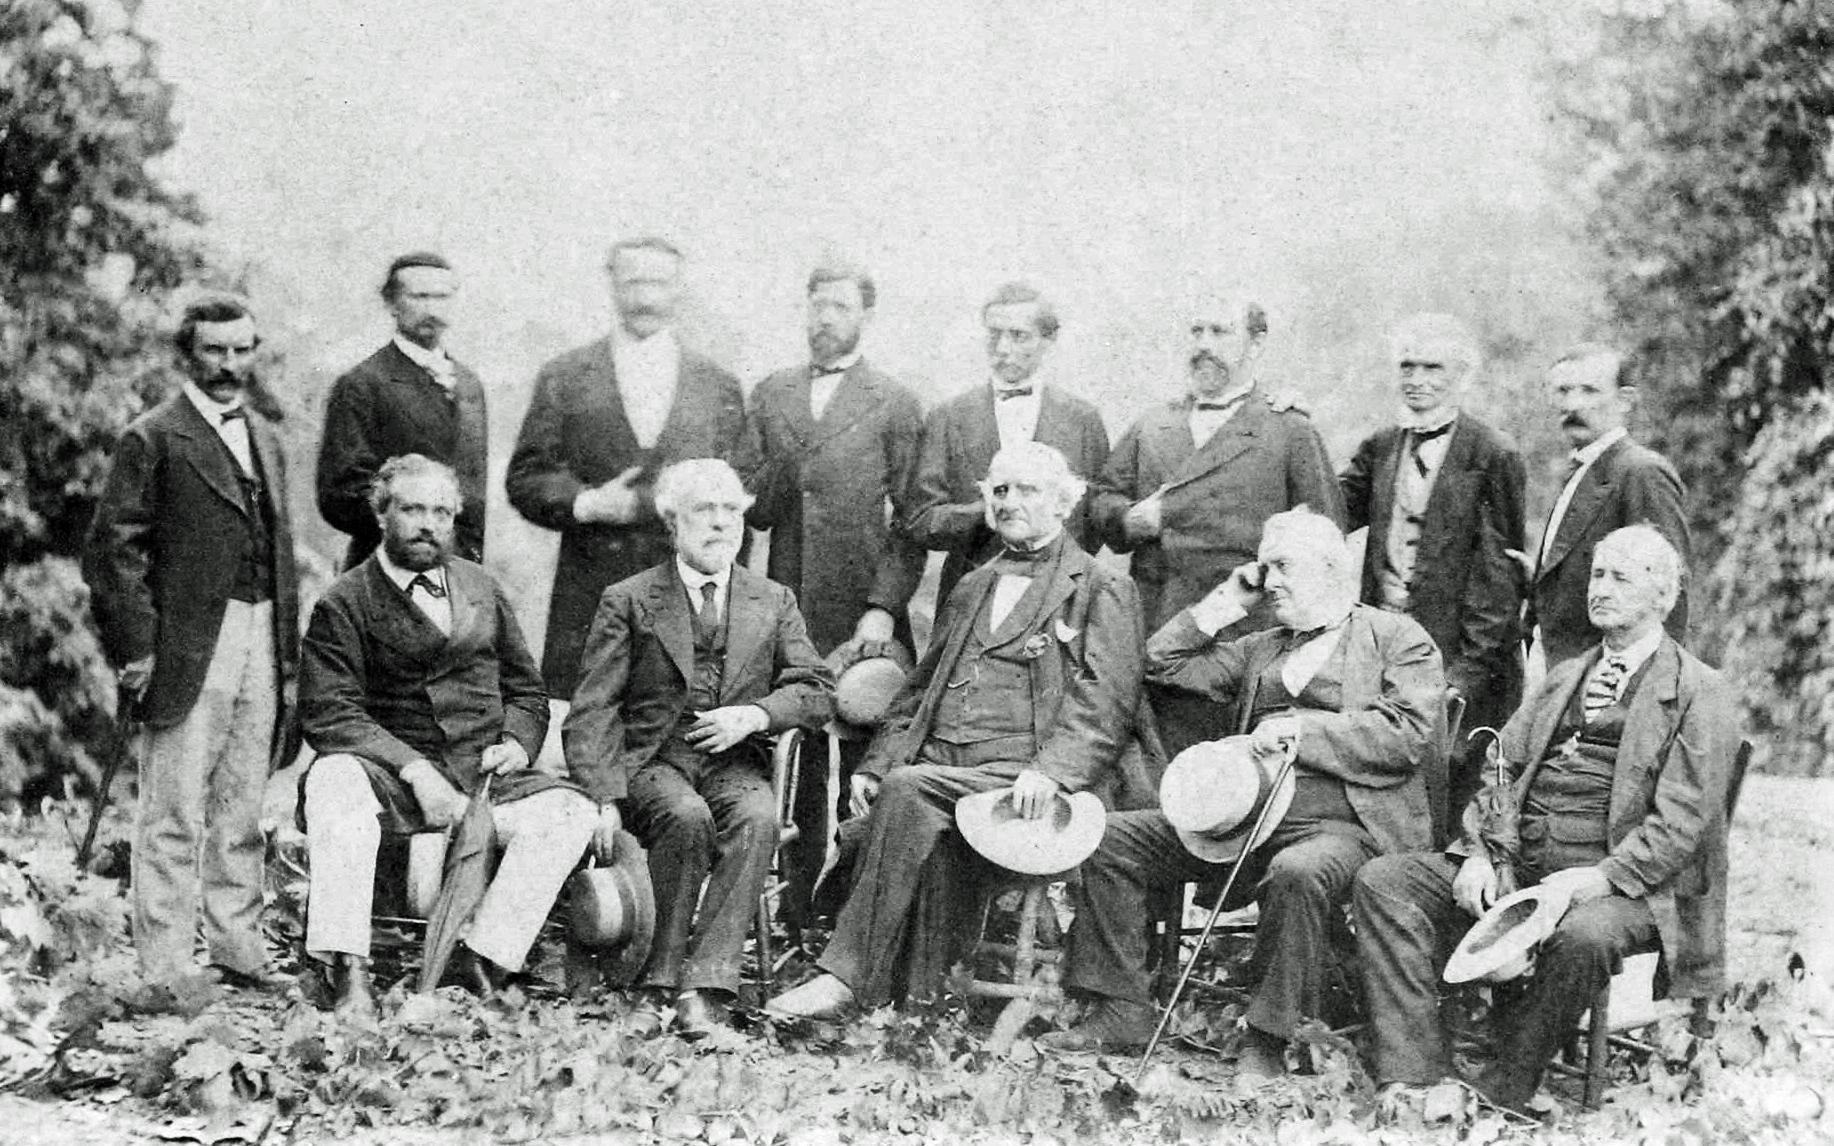 General Lee : a biography of Robert E. Lee